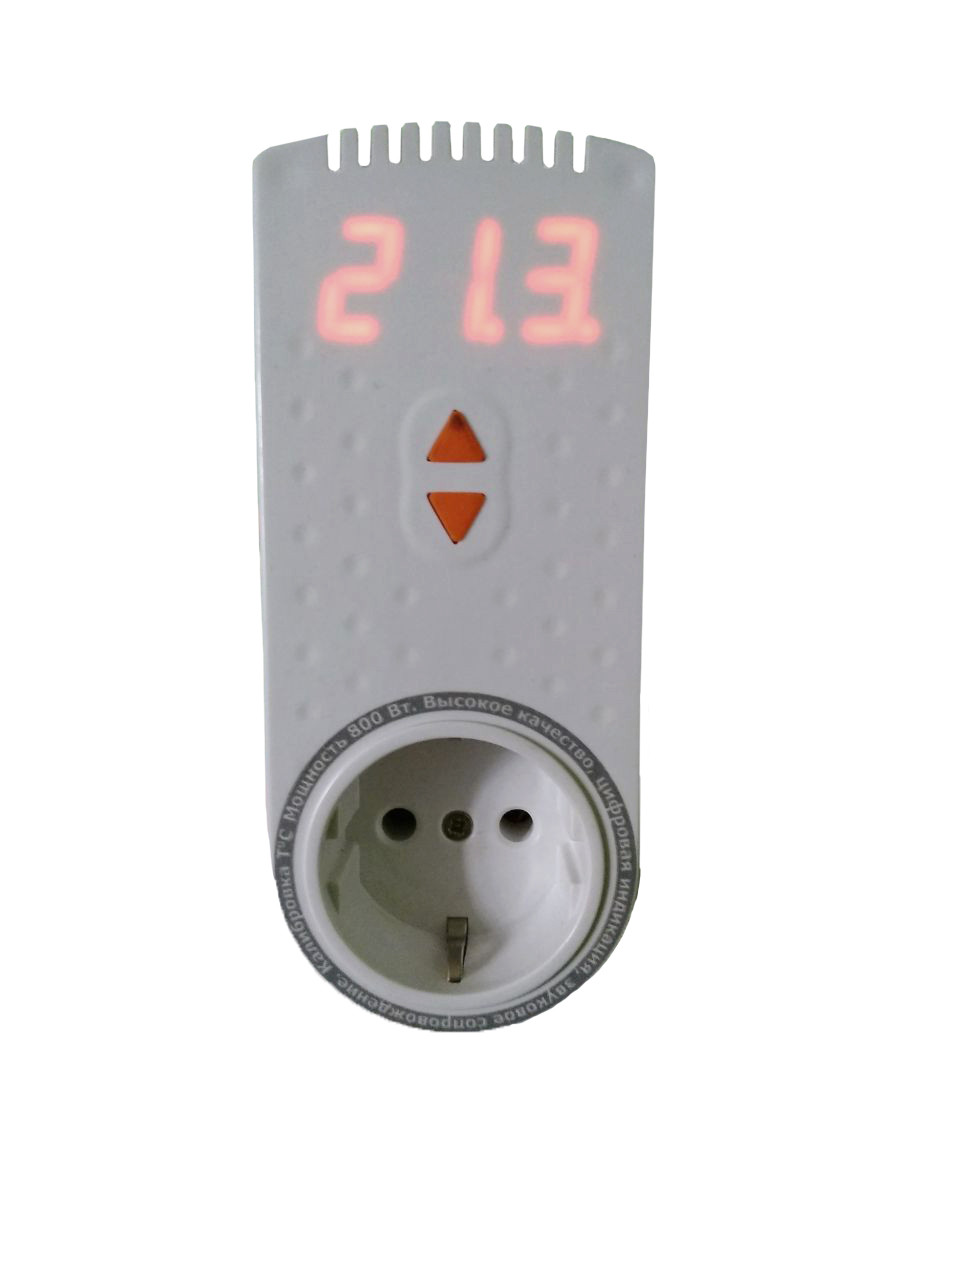 Цифровой Терморегулятор Рябушка TD для инкубатора